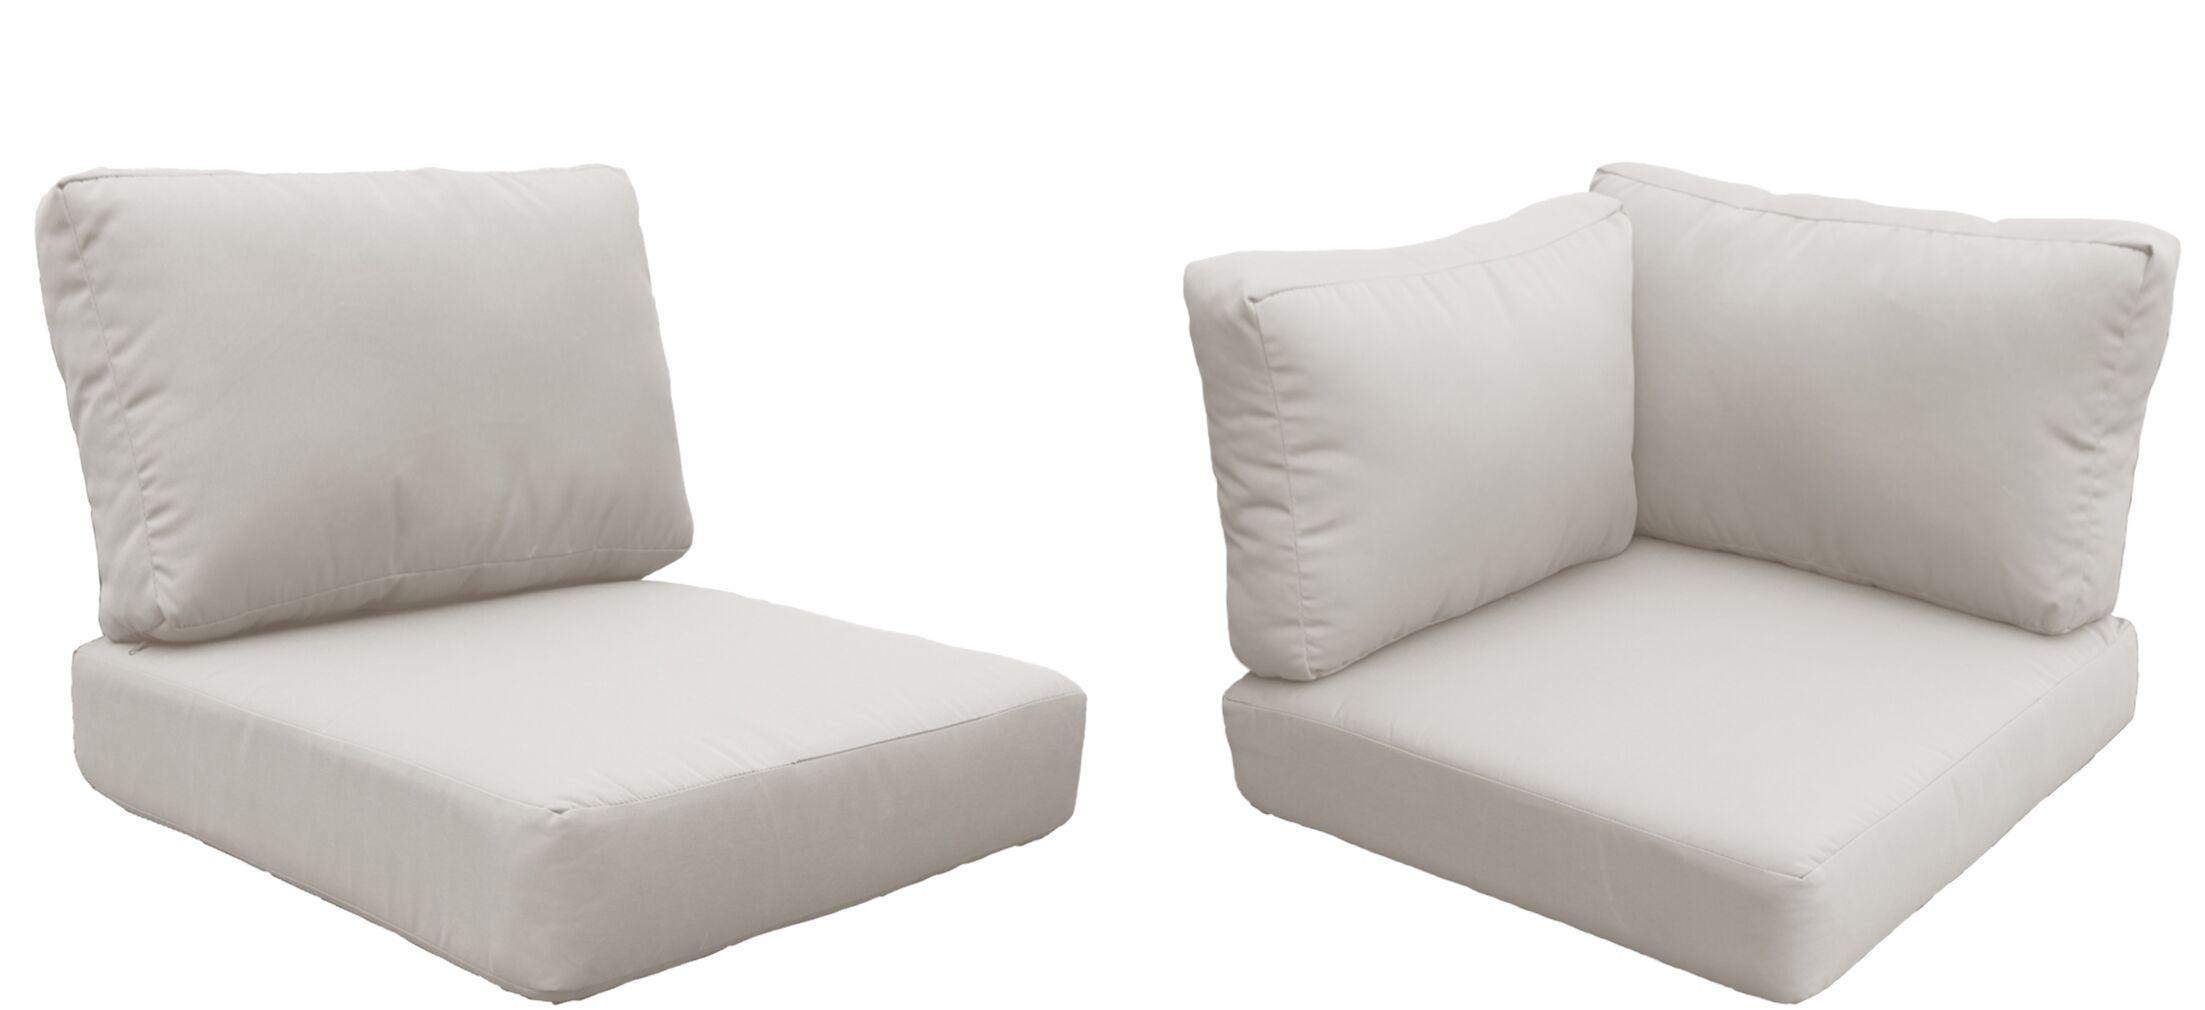 Barbados 14 Piece Outdoor Cushion Set Fabric: Beige